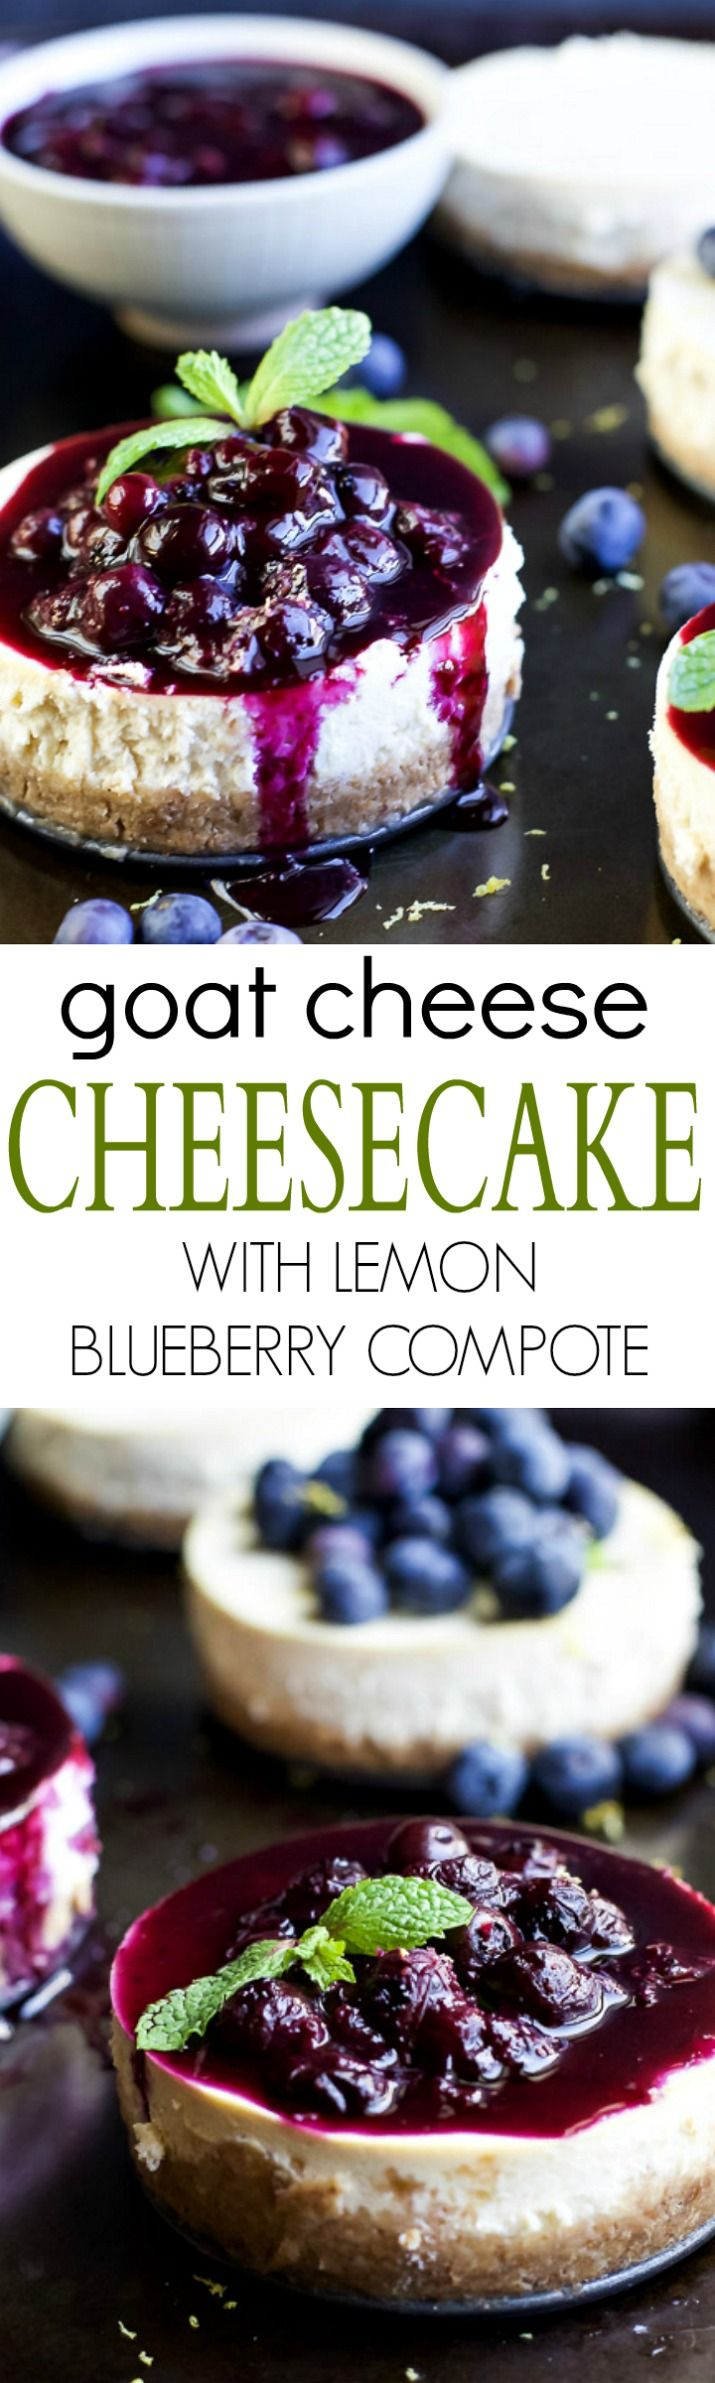 ... cheesecake healthy dessert recipes goat cheese cheesecake recipe goat